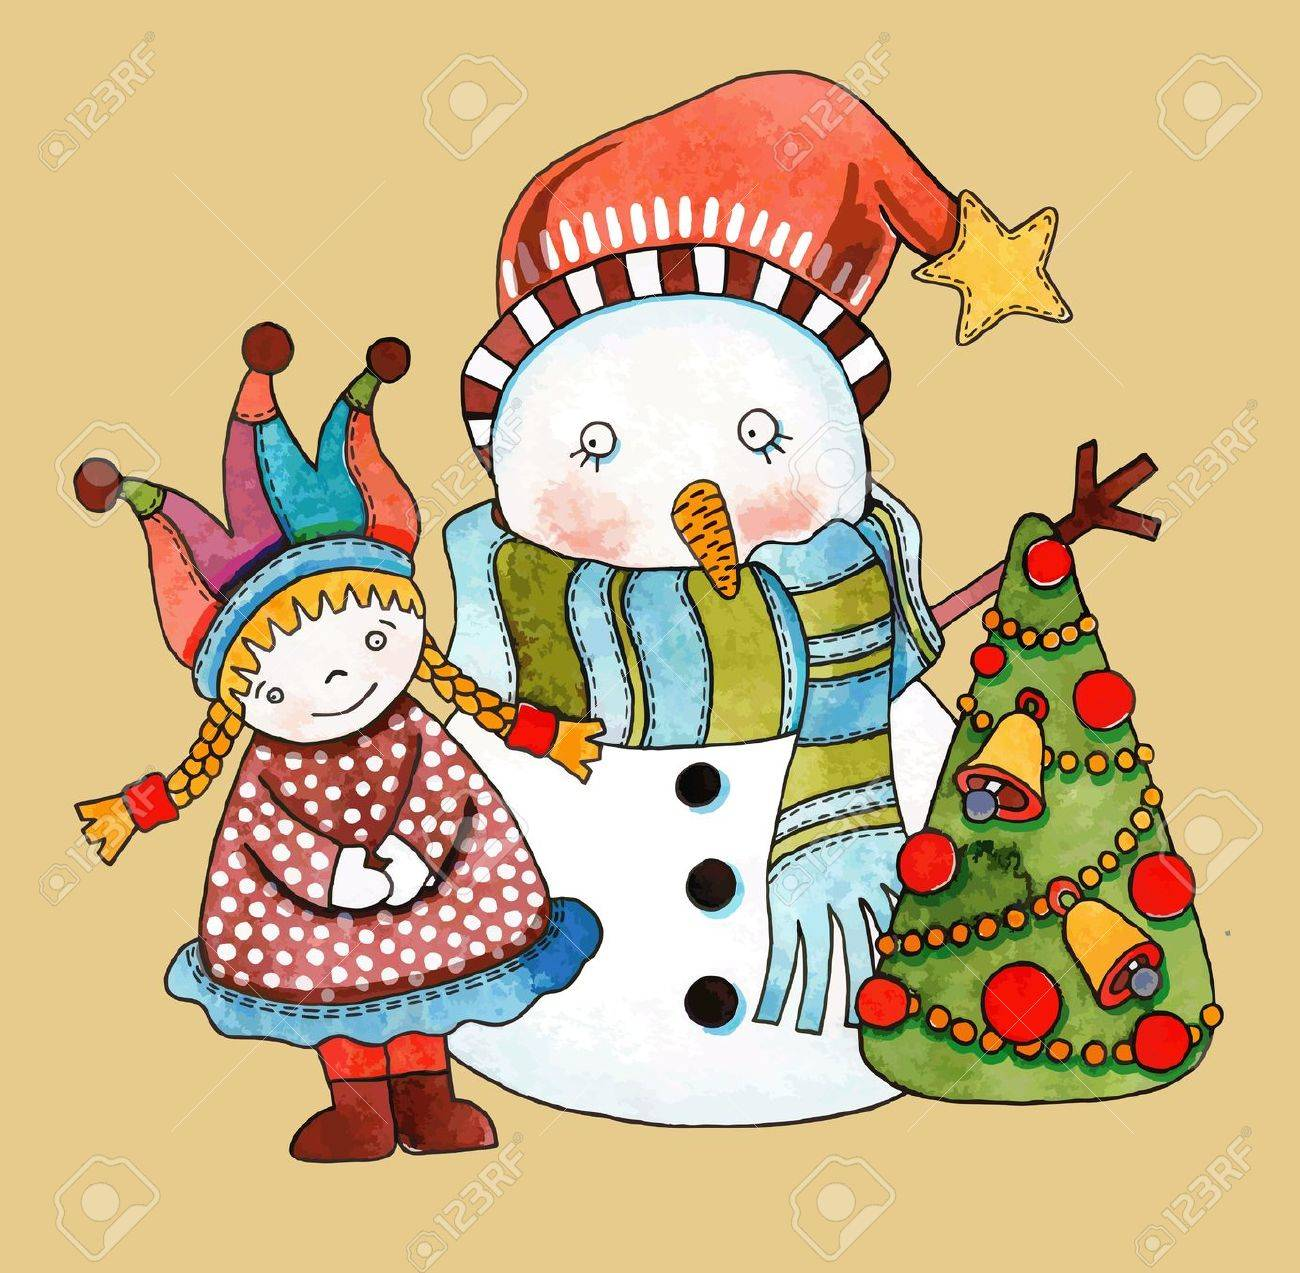 Christmas design. Watercolor snowman with girl and christmas tree Stock Vector - 11638847